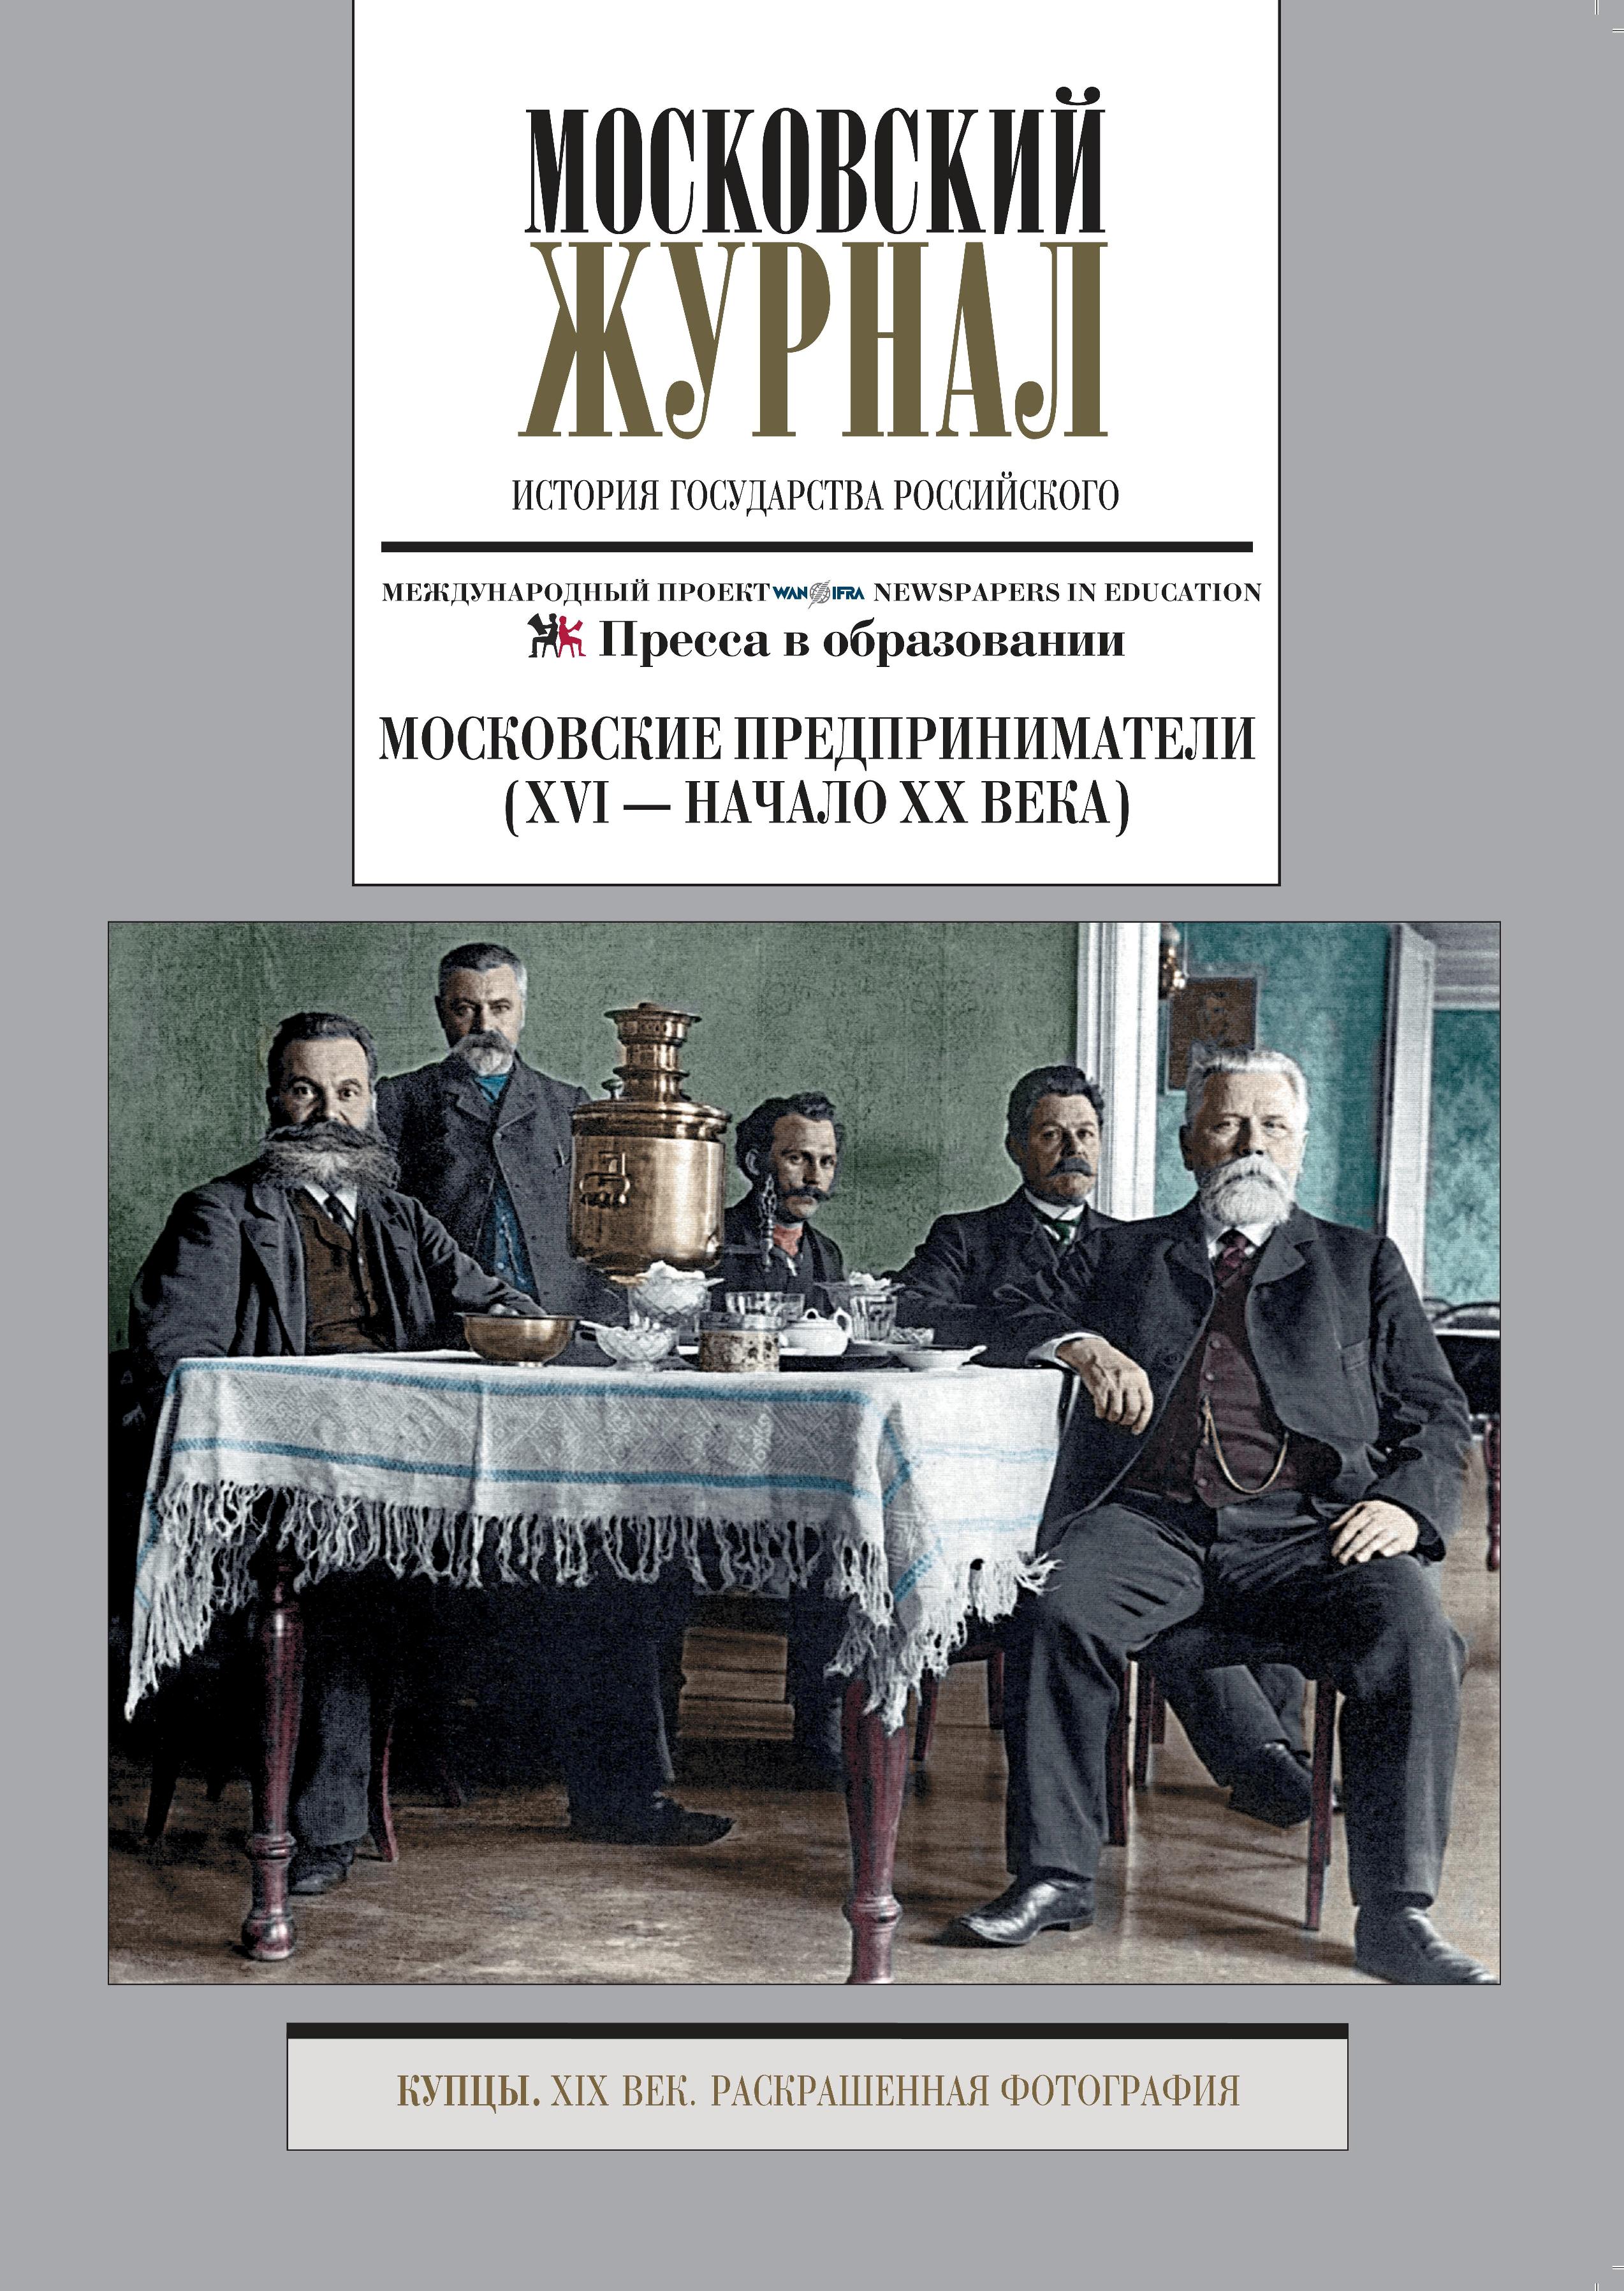 МОСКОВСКИЕ ПРЕДПРИНИМАТЕЛИ (XVI — НАЧАЛО ХХ ВЕКА)